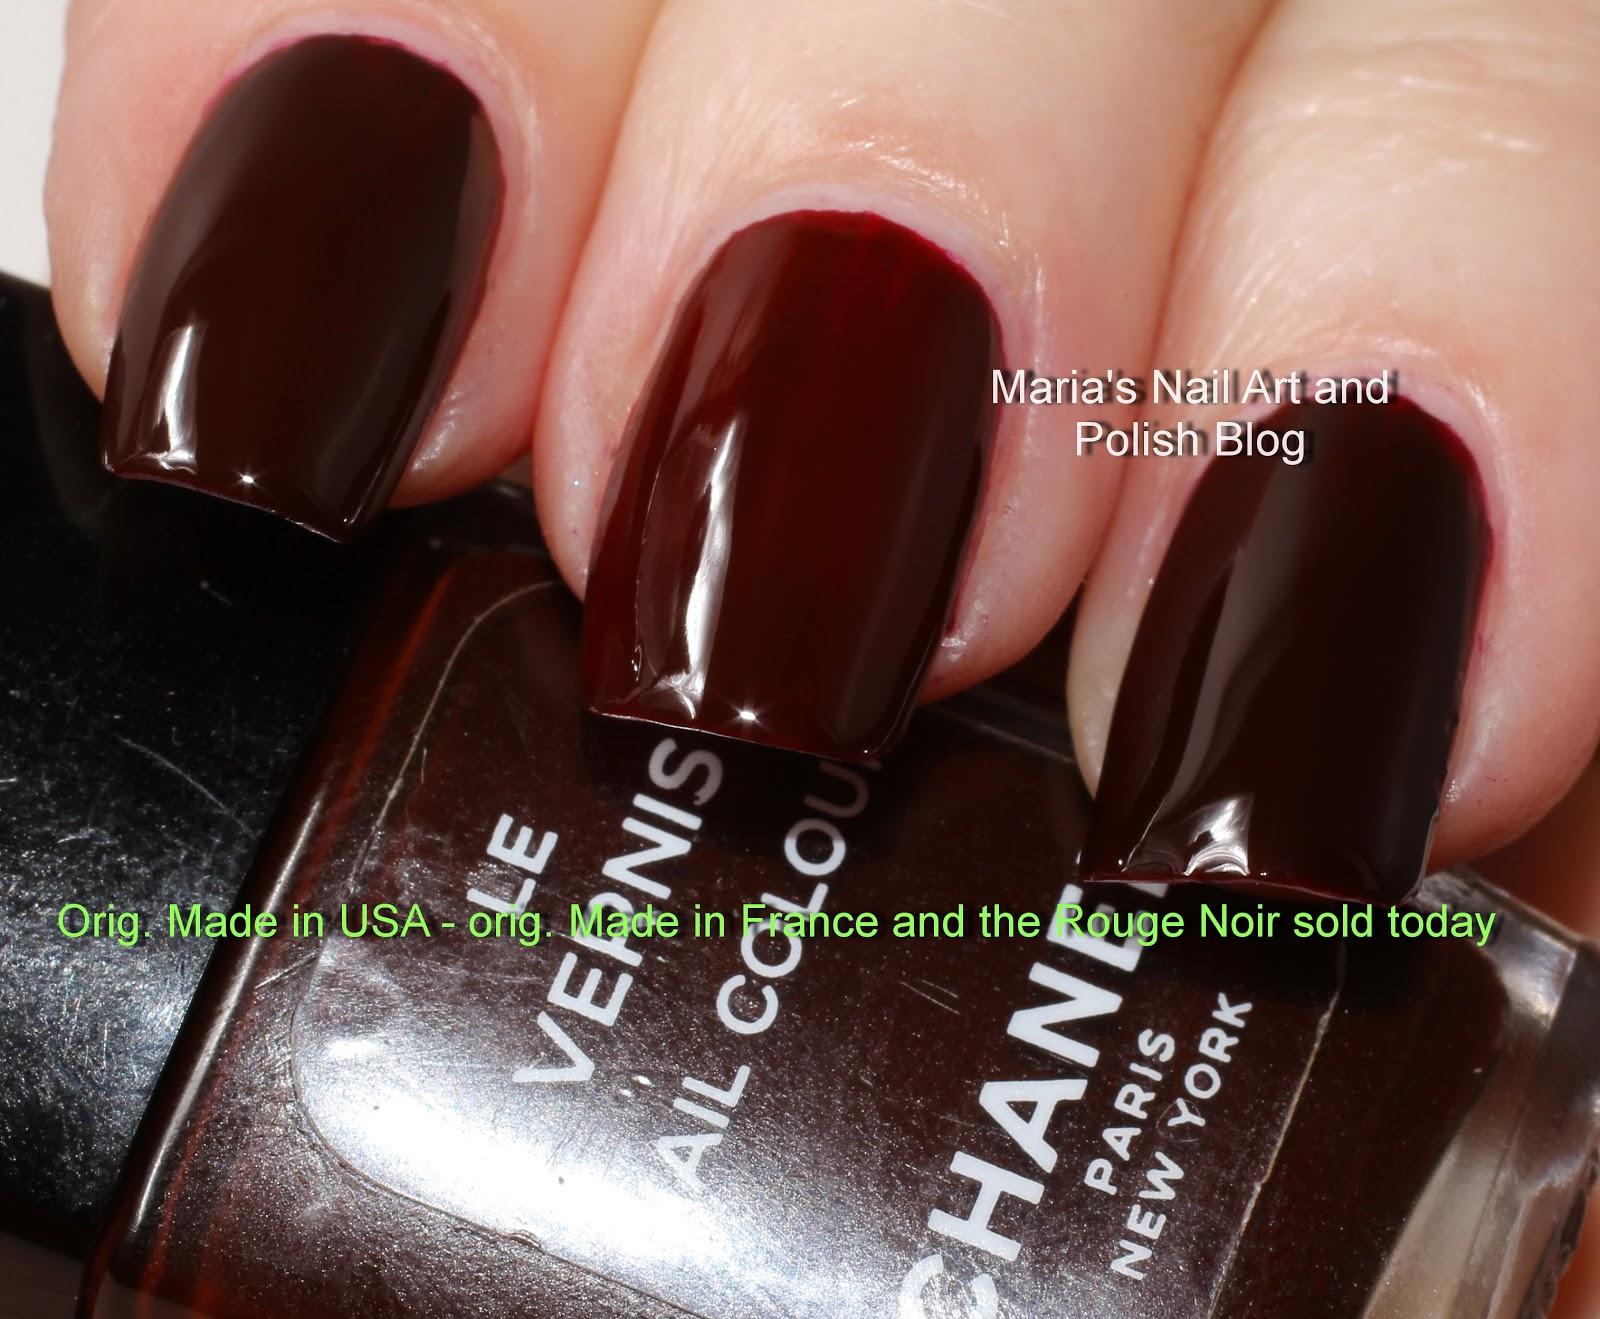 marias nail art and polish blog chanel rouge noir 18 vamp 18 5 x 18 the vamp triology. Black Bedroom Furniture Sets. Home Design Ideas